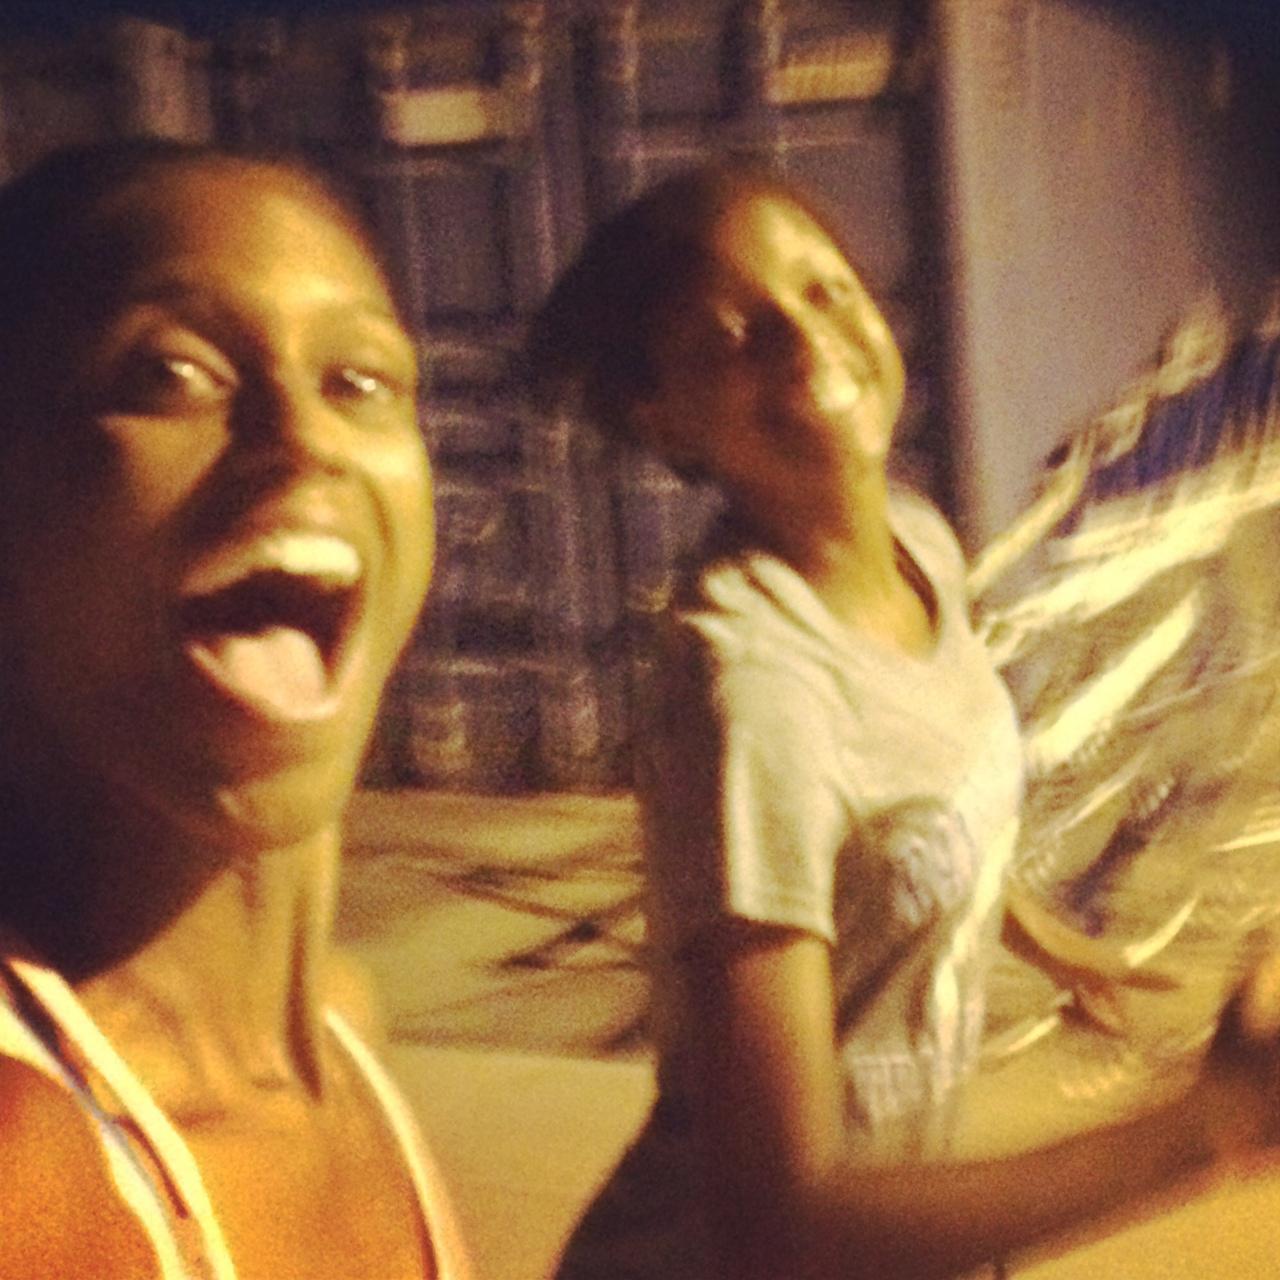 Night running w/my XC girl! Different, Fun!